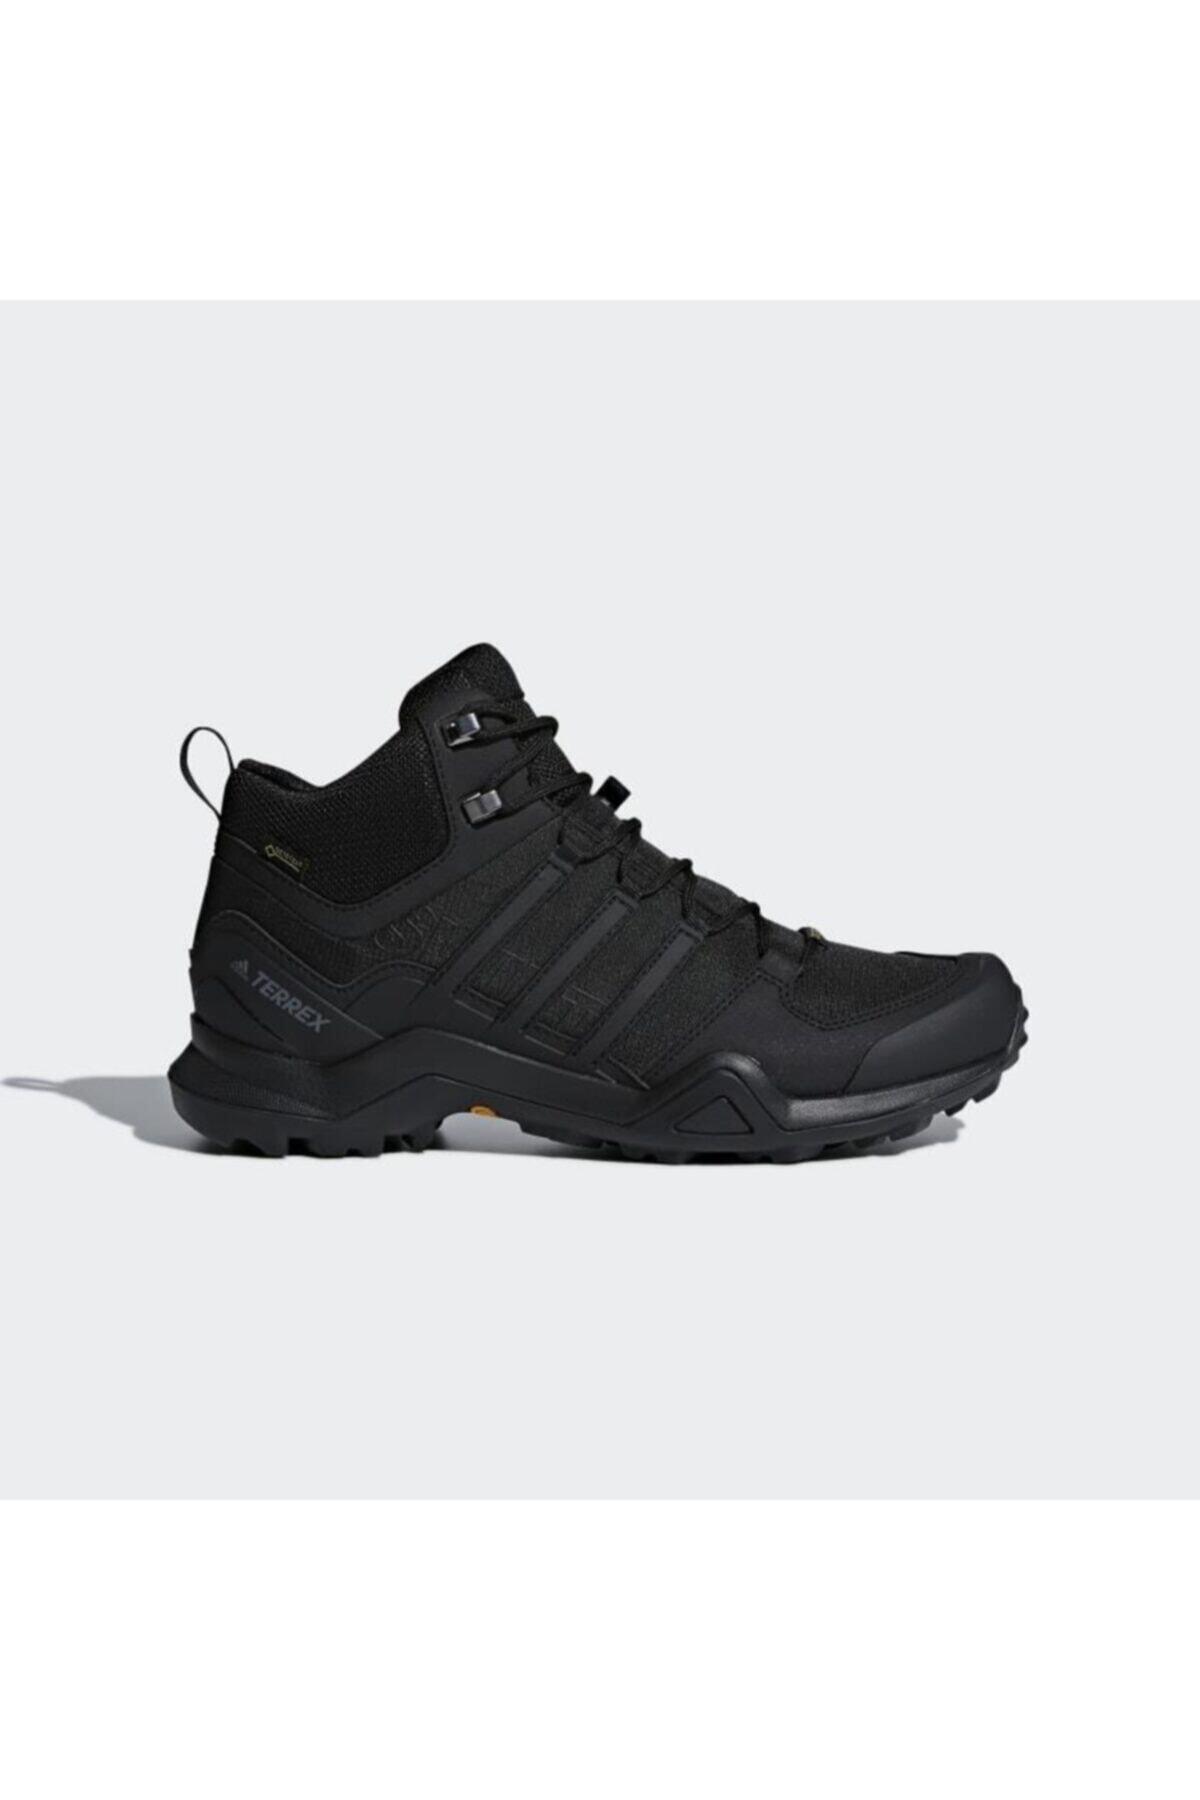 خرید مستقیم کفش کوهنوردی جدید برند آدیداس رنگ مشکی کد ty3610855